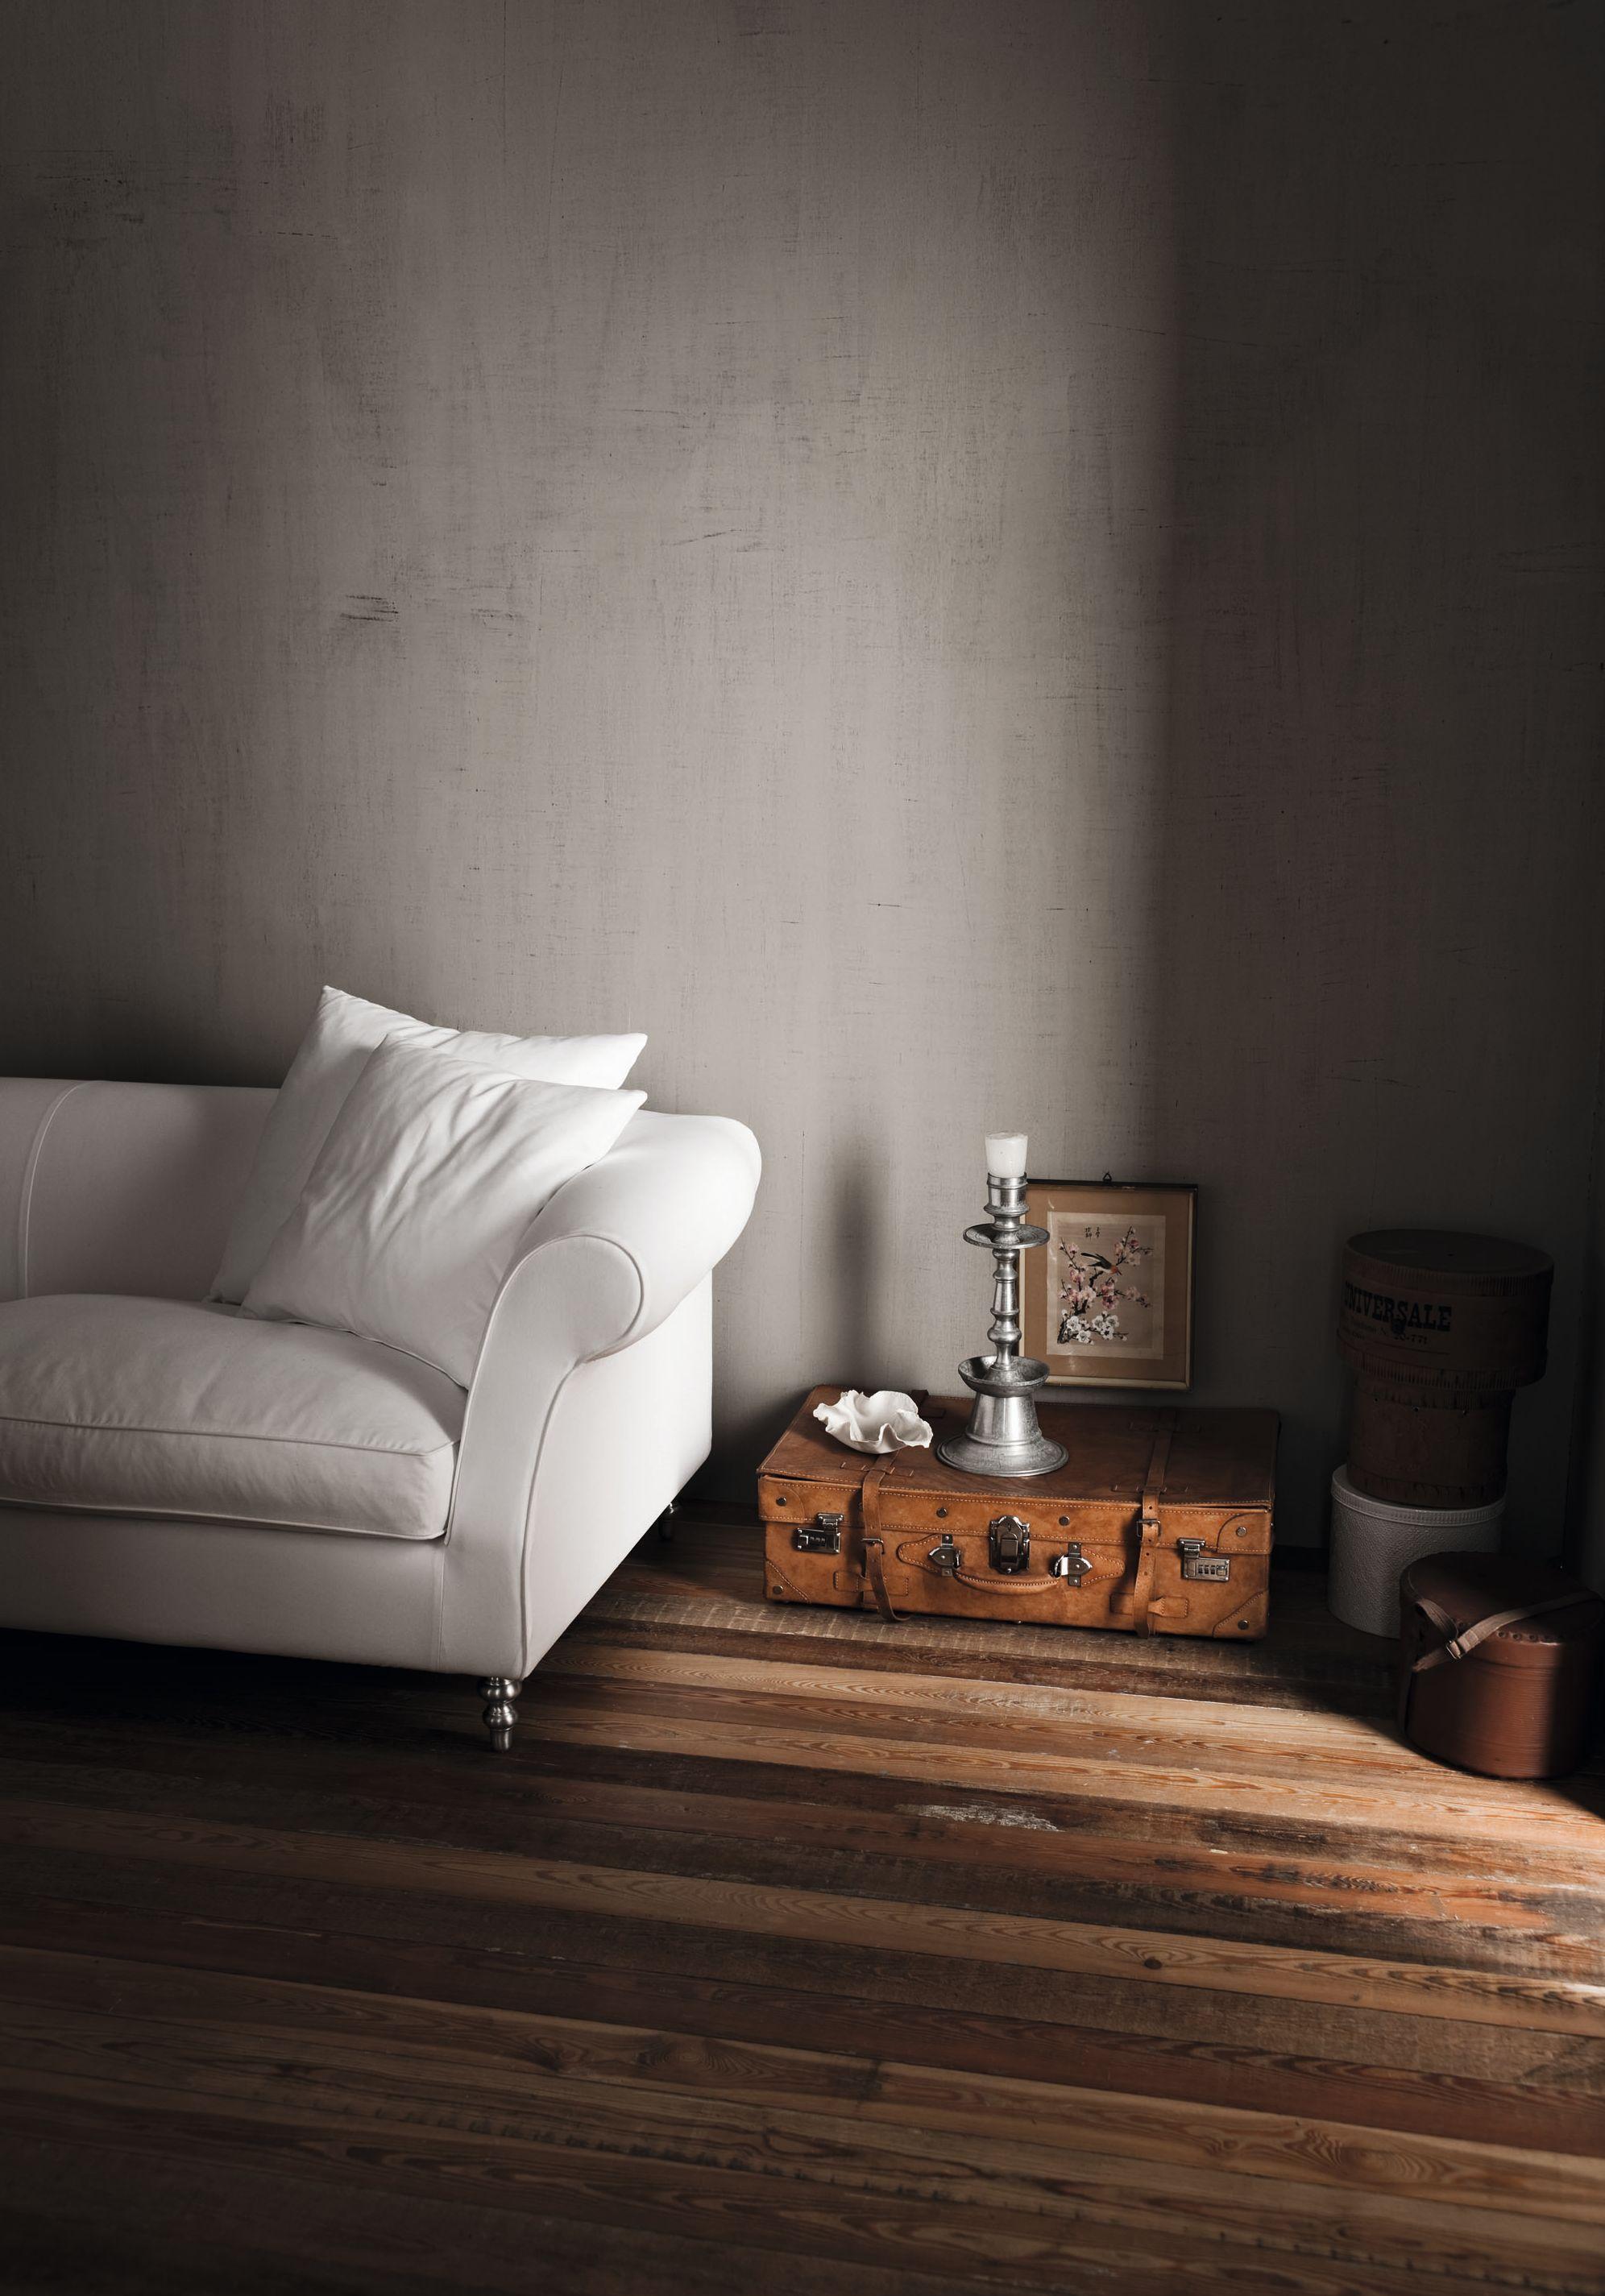 saba canape opium mobili mariani. Black Bedroom Furniture Sets. Home Design Ideas